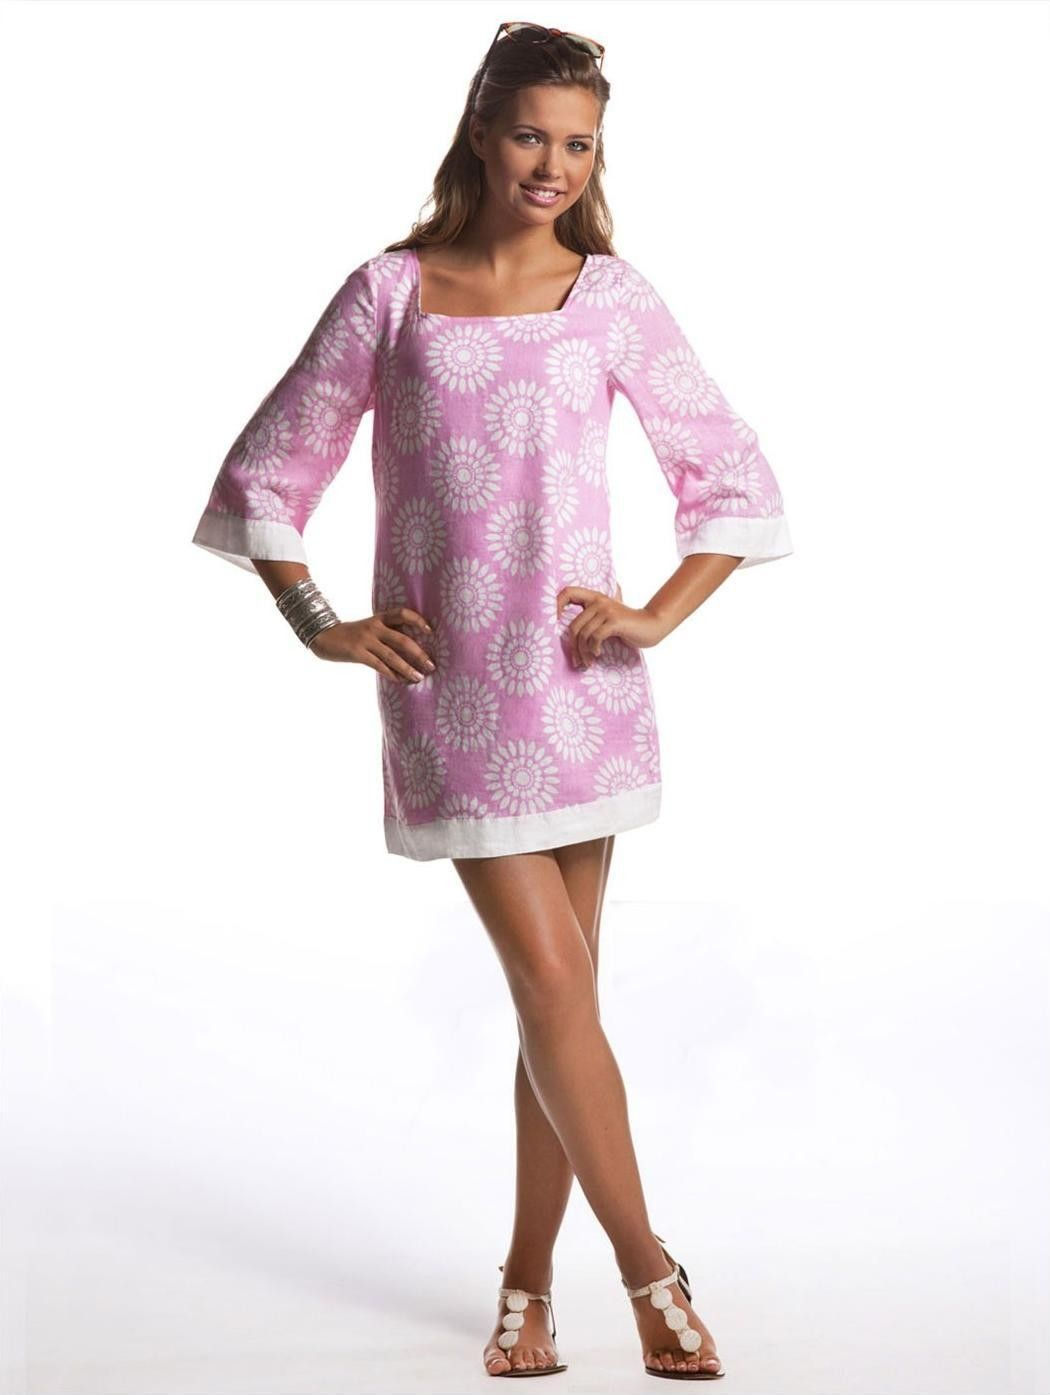 Grenadine chica dress island dresses island company fashion